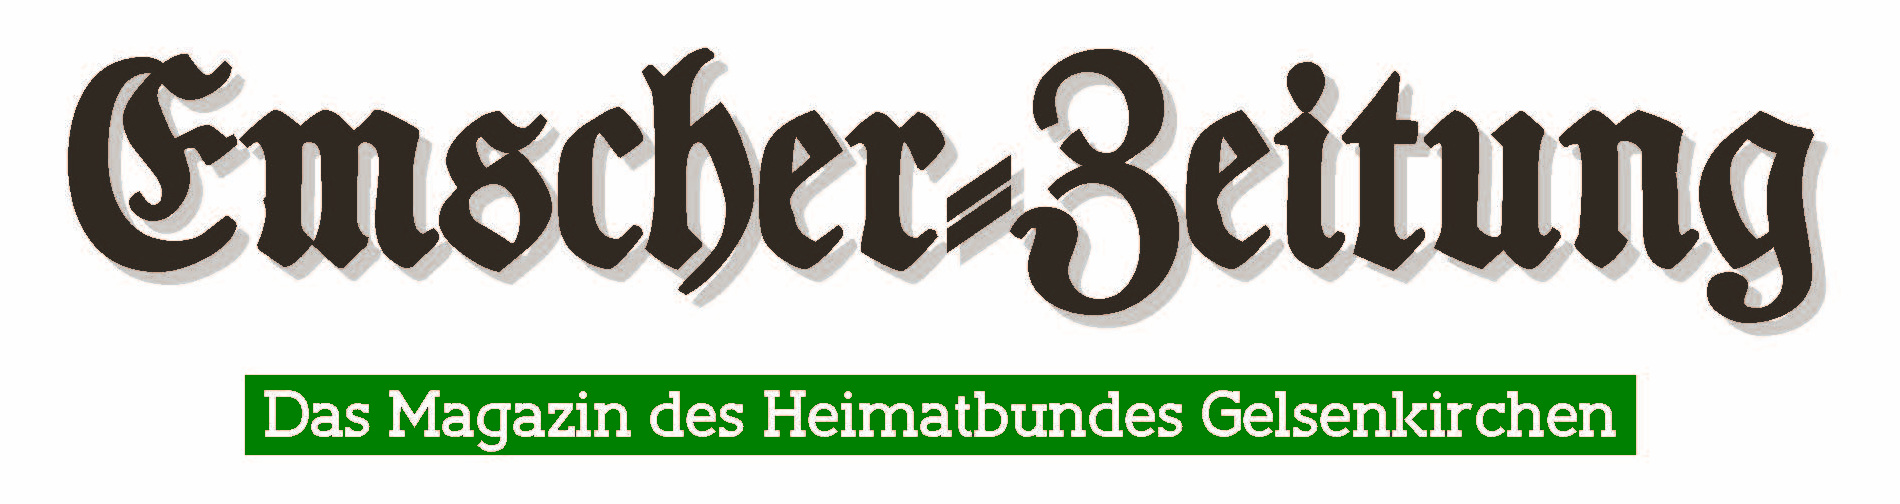 Emscher-Zeitung